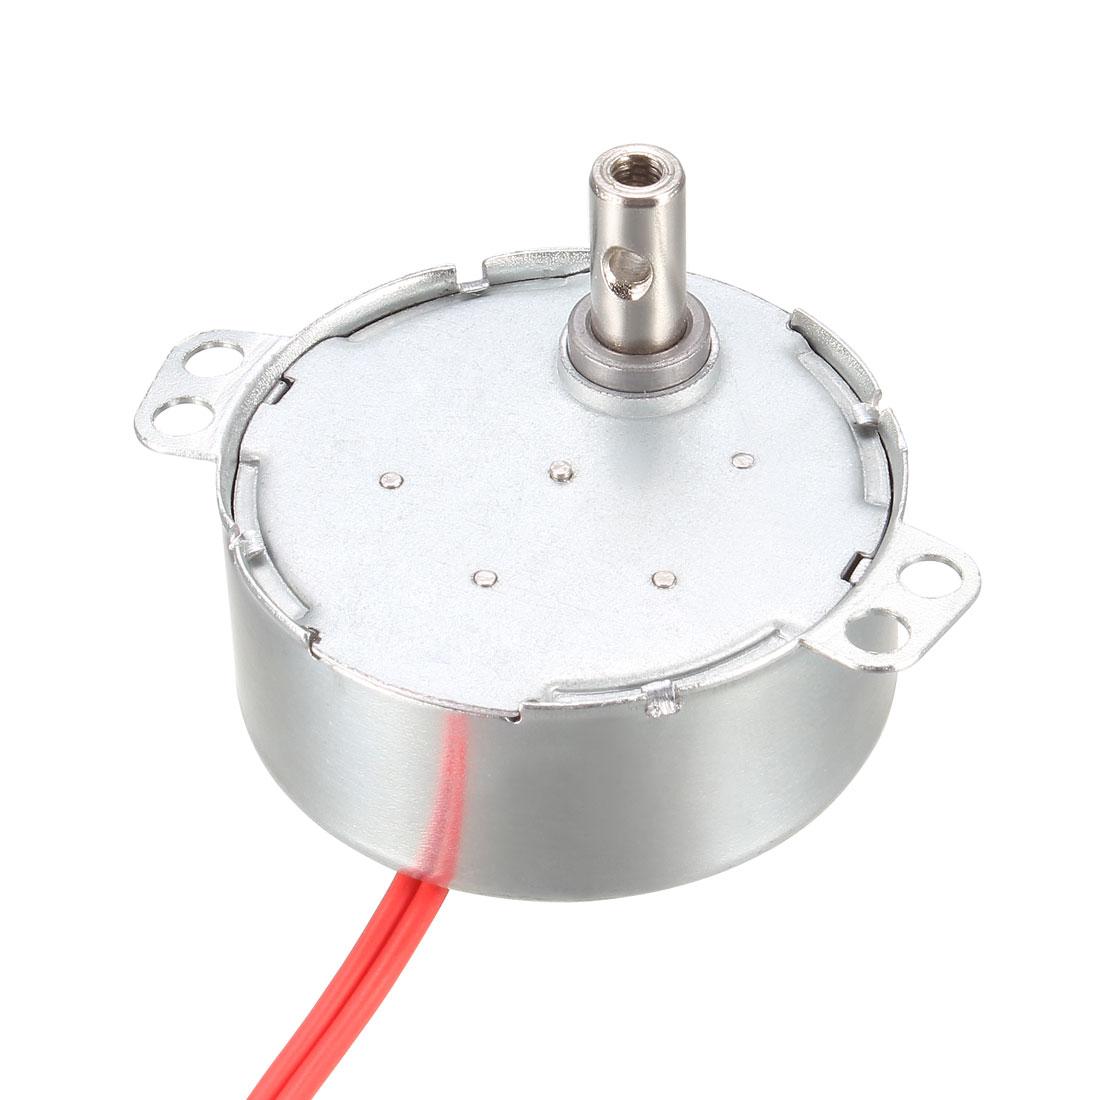 Synchronous Synchron Motor - Turntable Motor AC 24V 50-60Hz CCW/CW 4W 2-2.4RPM